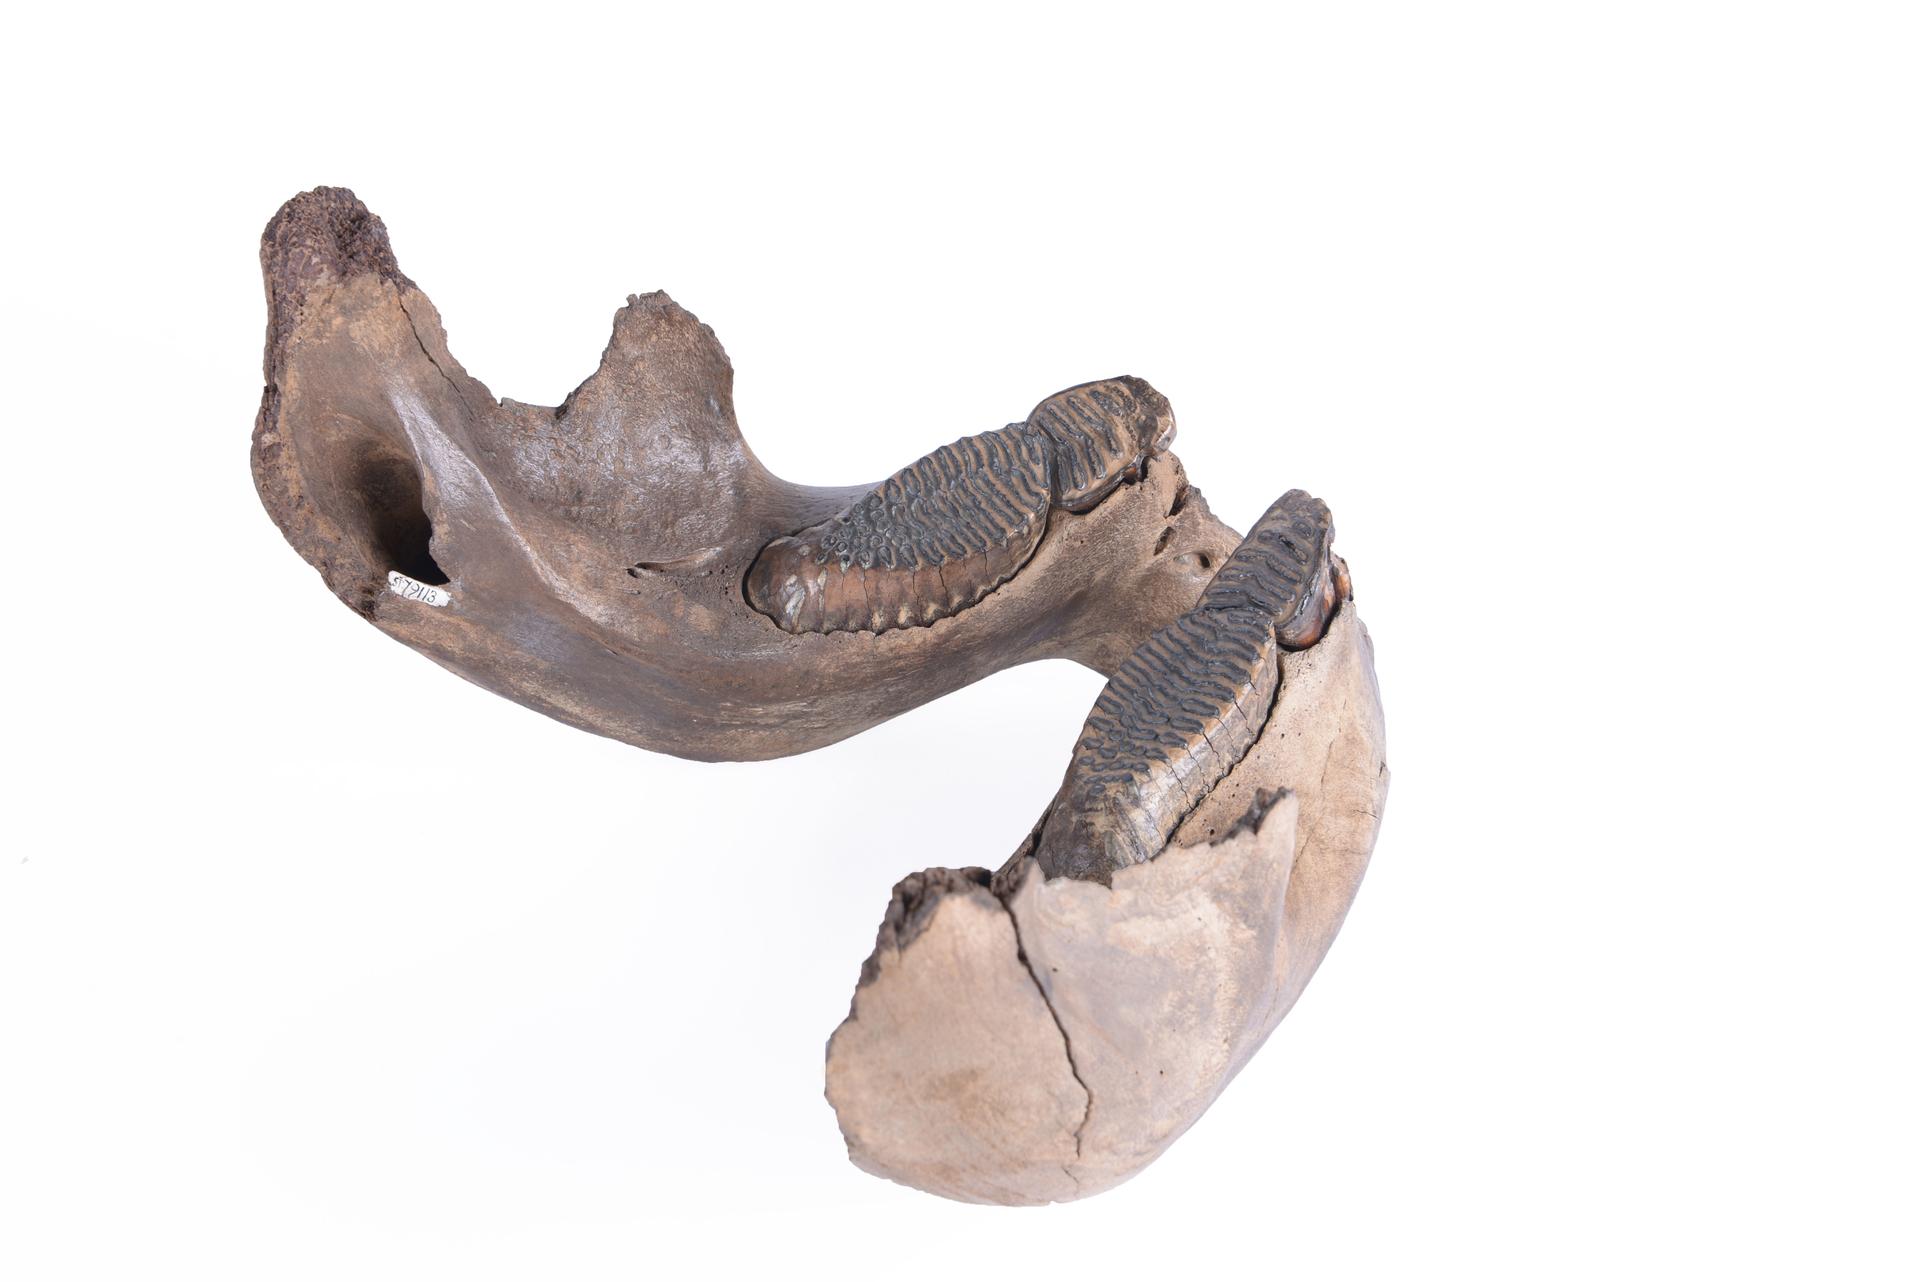 RGM.79113.a | Mammuthus primigenius Blumenbach, 1799